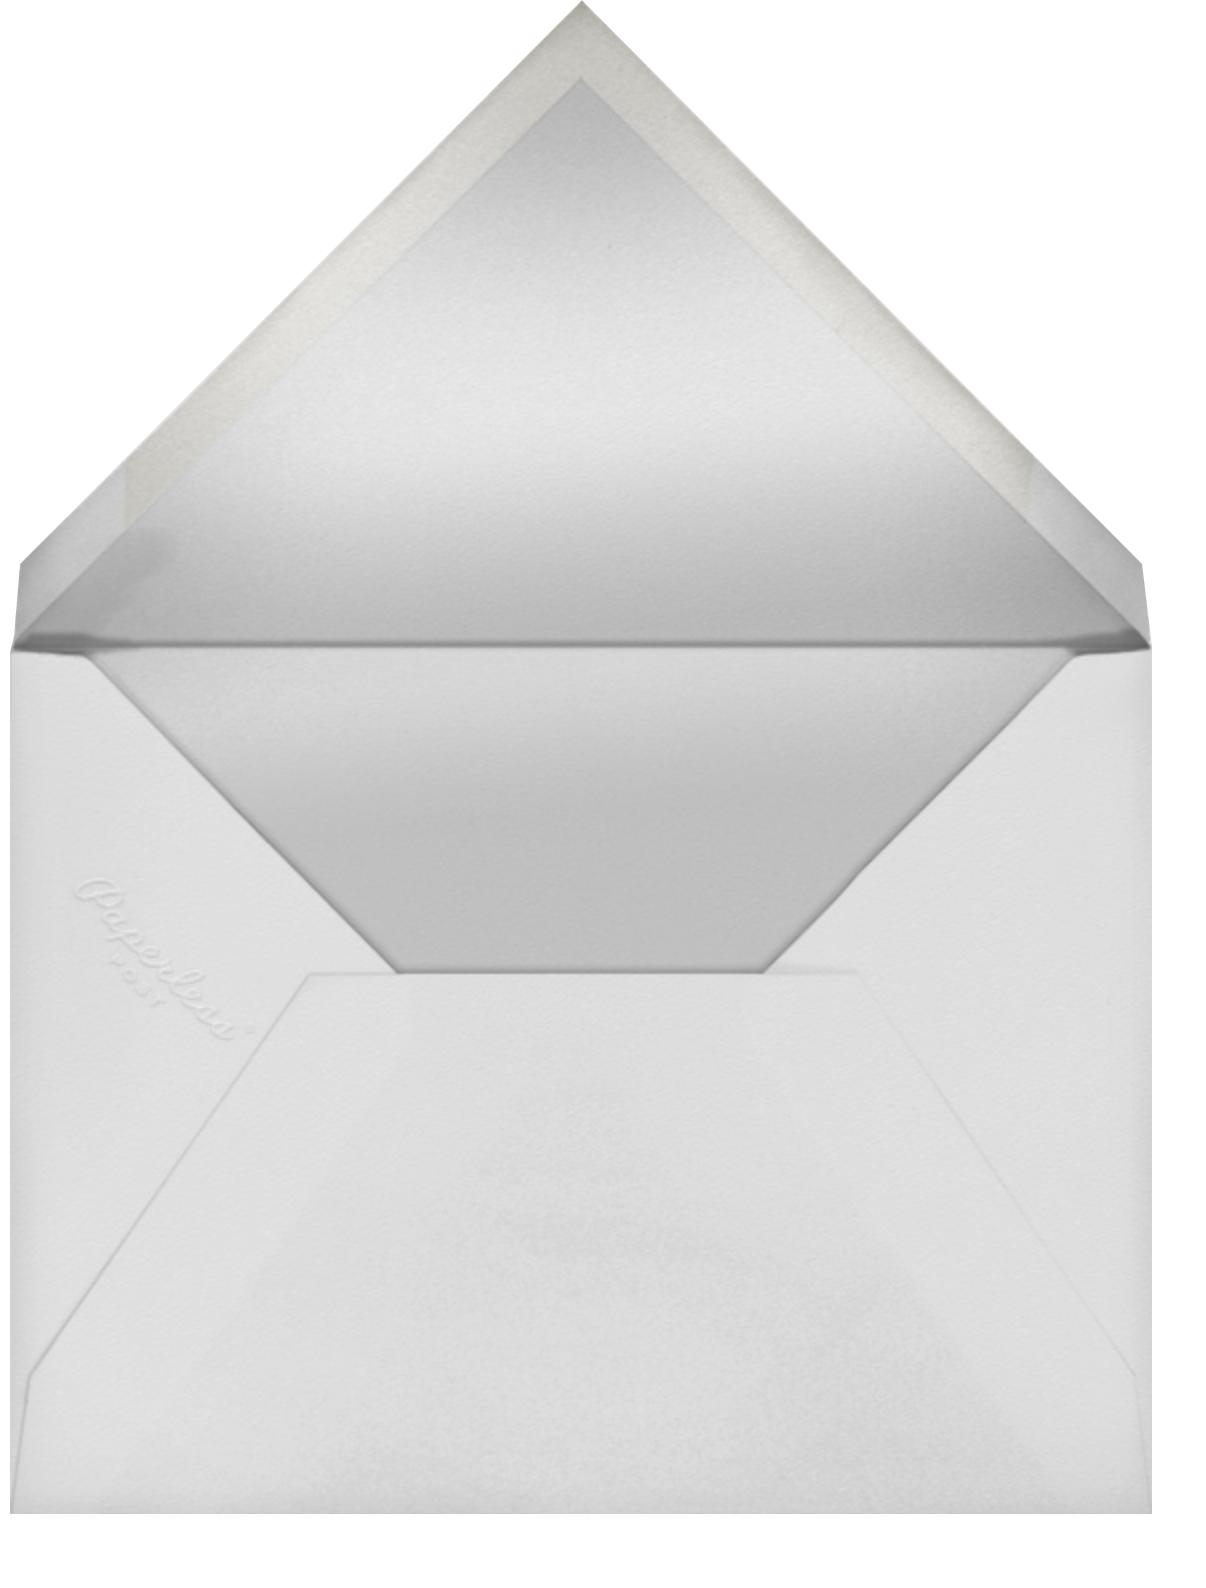 Grunge Border - Paperless Post - Envelope